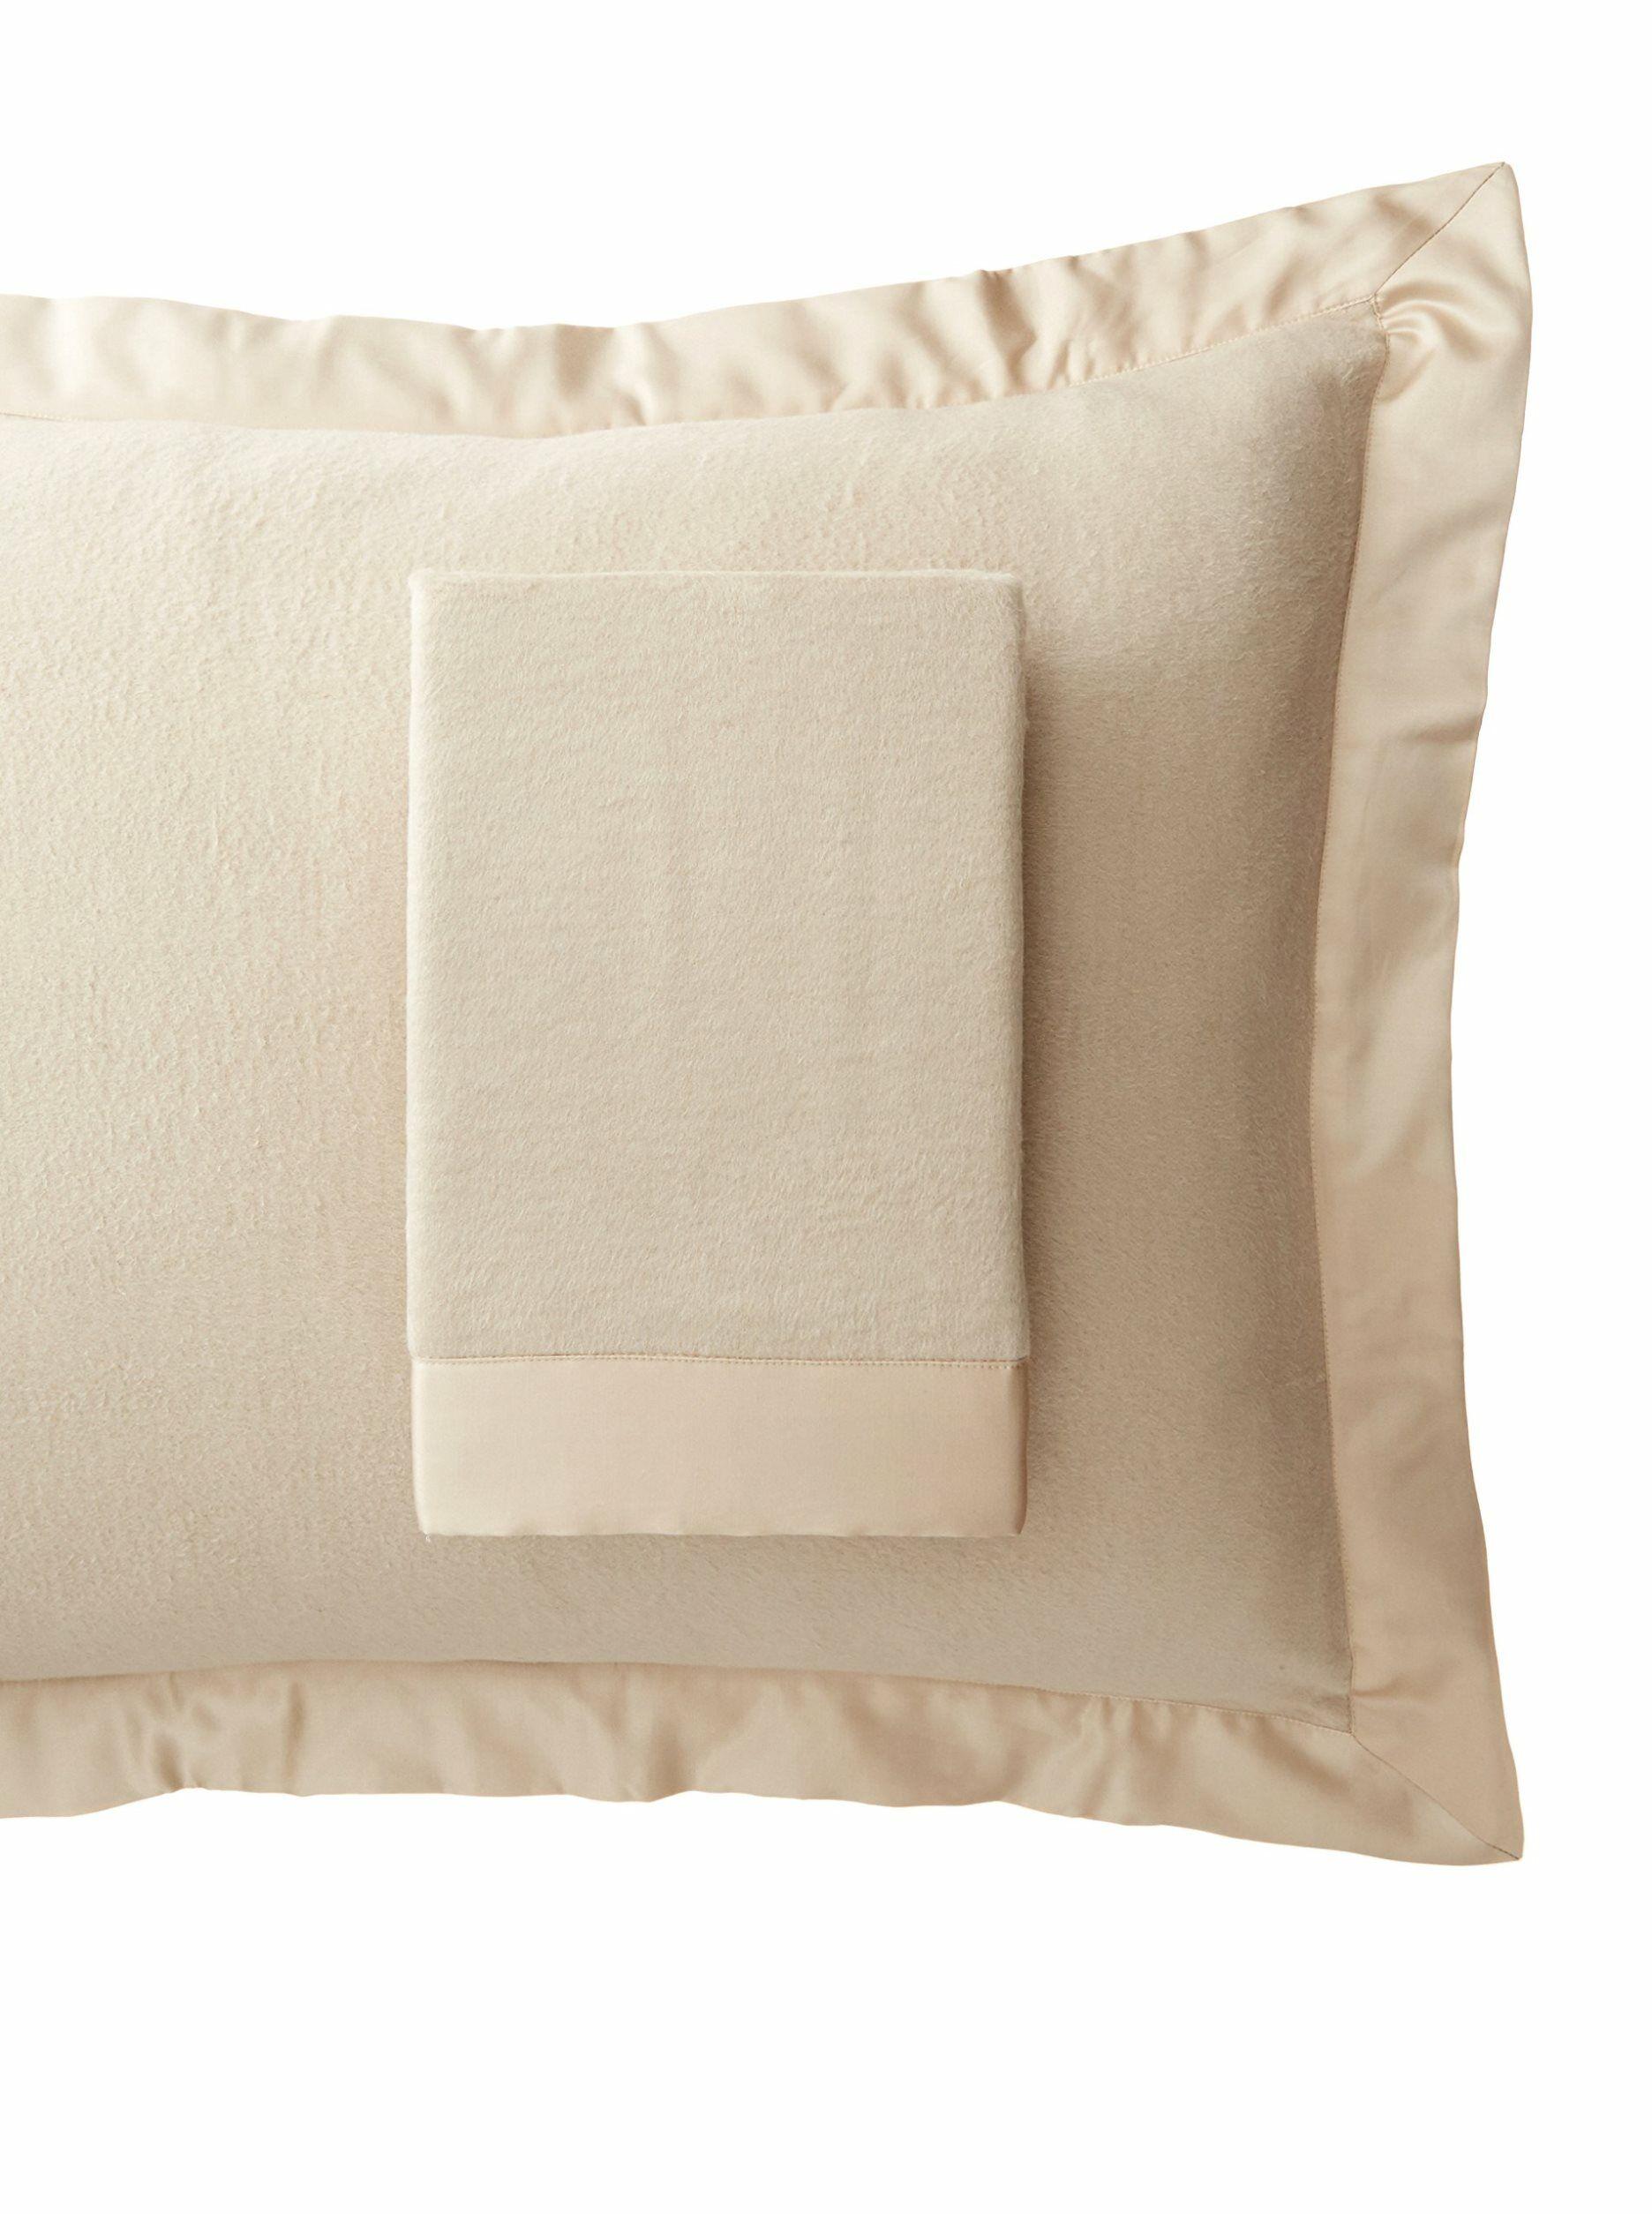 Luxury Pure Silk Fleece Pillow Sham Color: Creamy Latte, Size: Queen